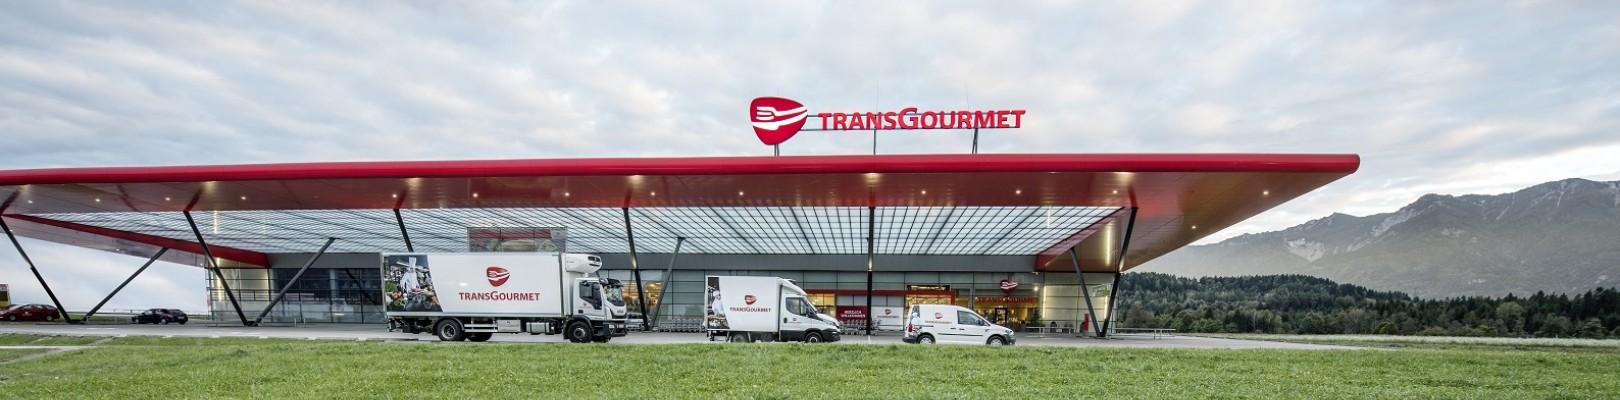 Transgourmet Mainz